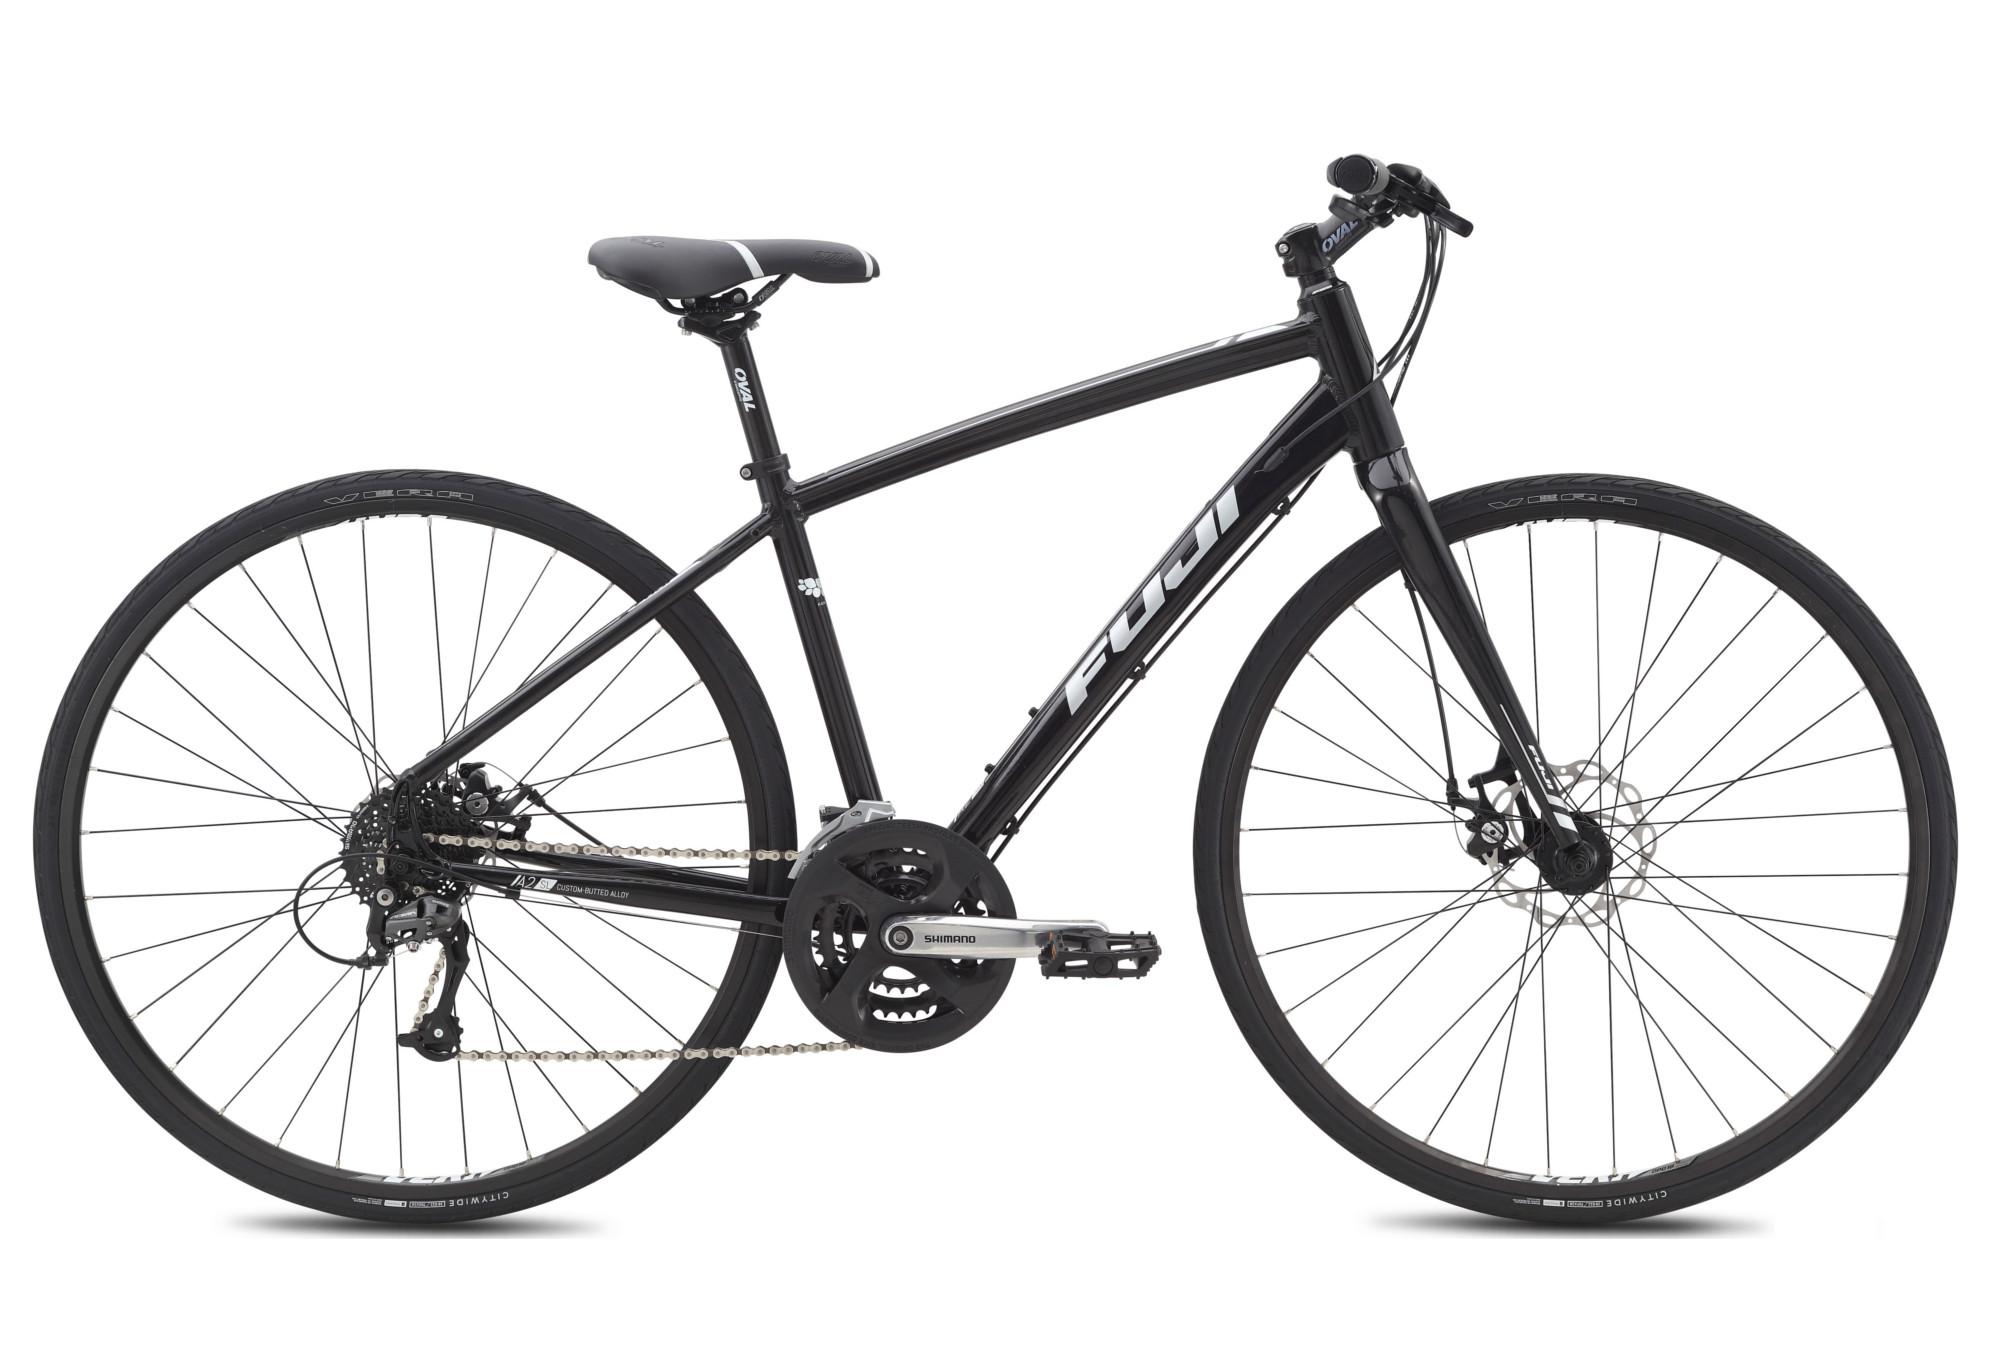 Fuji Woman City Bike Silhouette 1 7 Disc 700c Shimano Alivio 9 Speed Black White